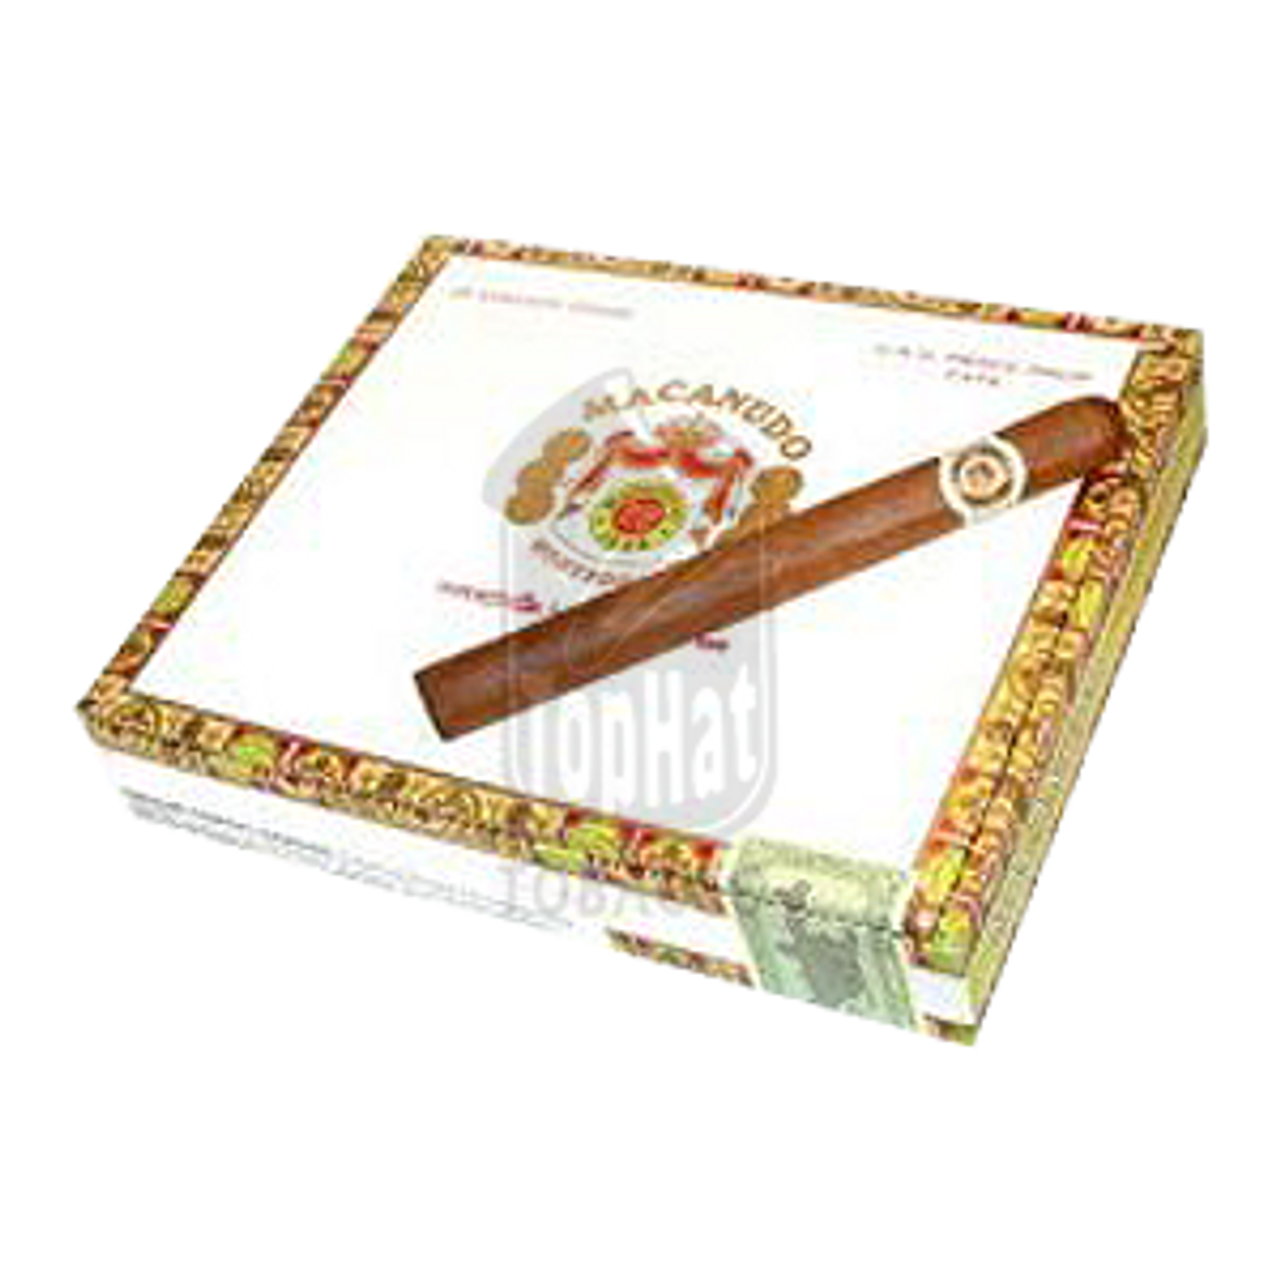 Macanudo Prince Philip Cigars - 7 x 49 (Box of 10)